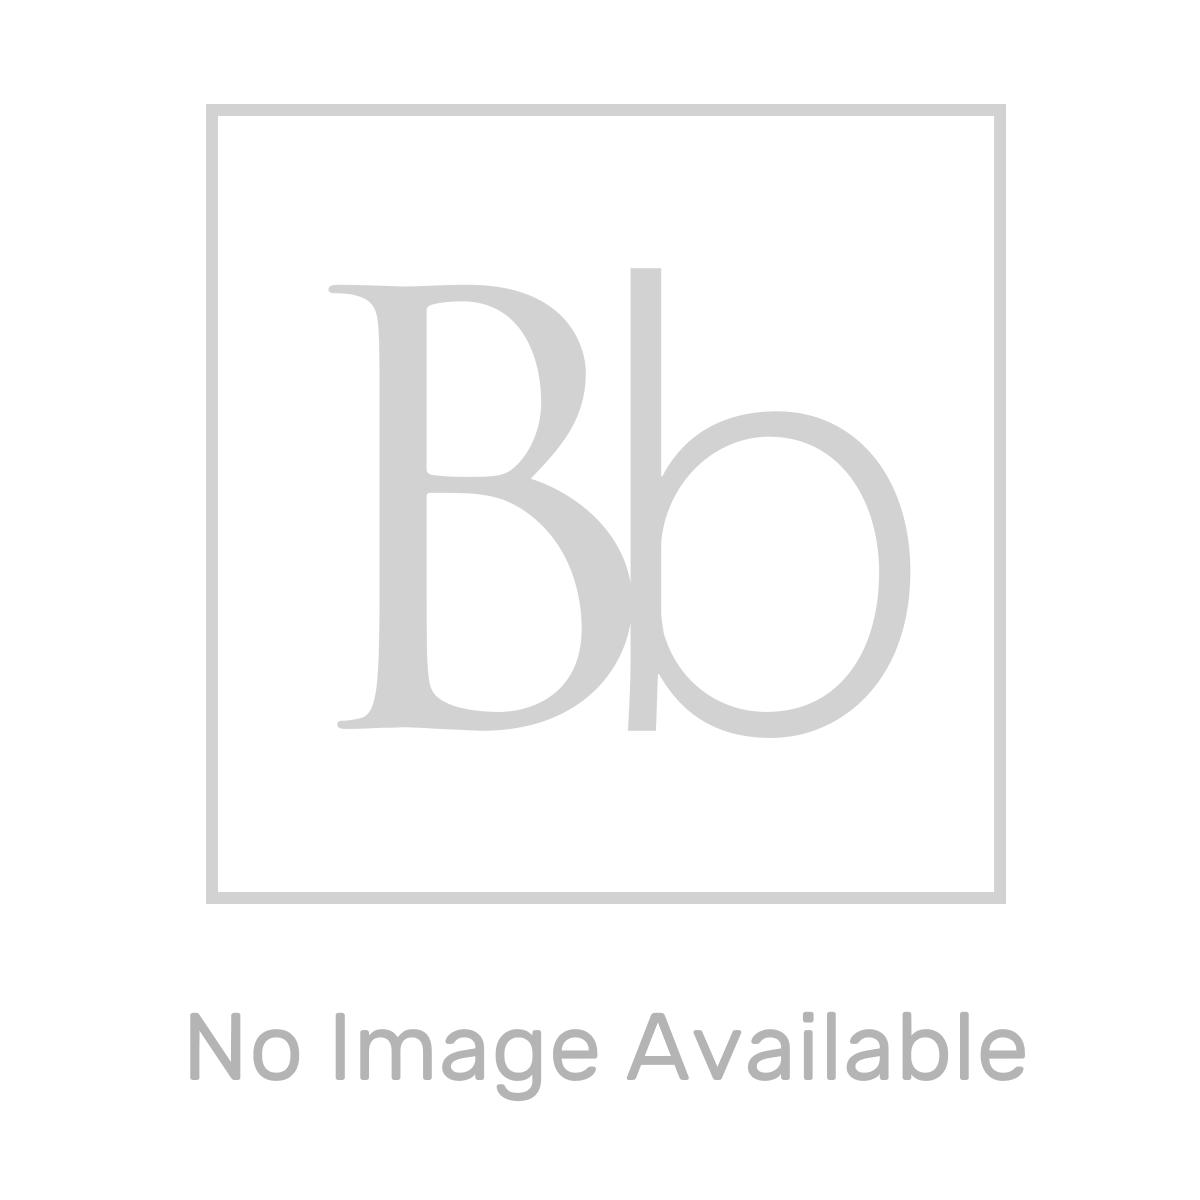 RAK Scorpio Heated LED Mirror 800 x 800 Line Drawing